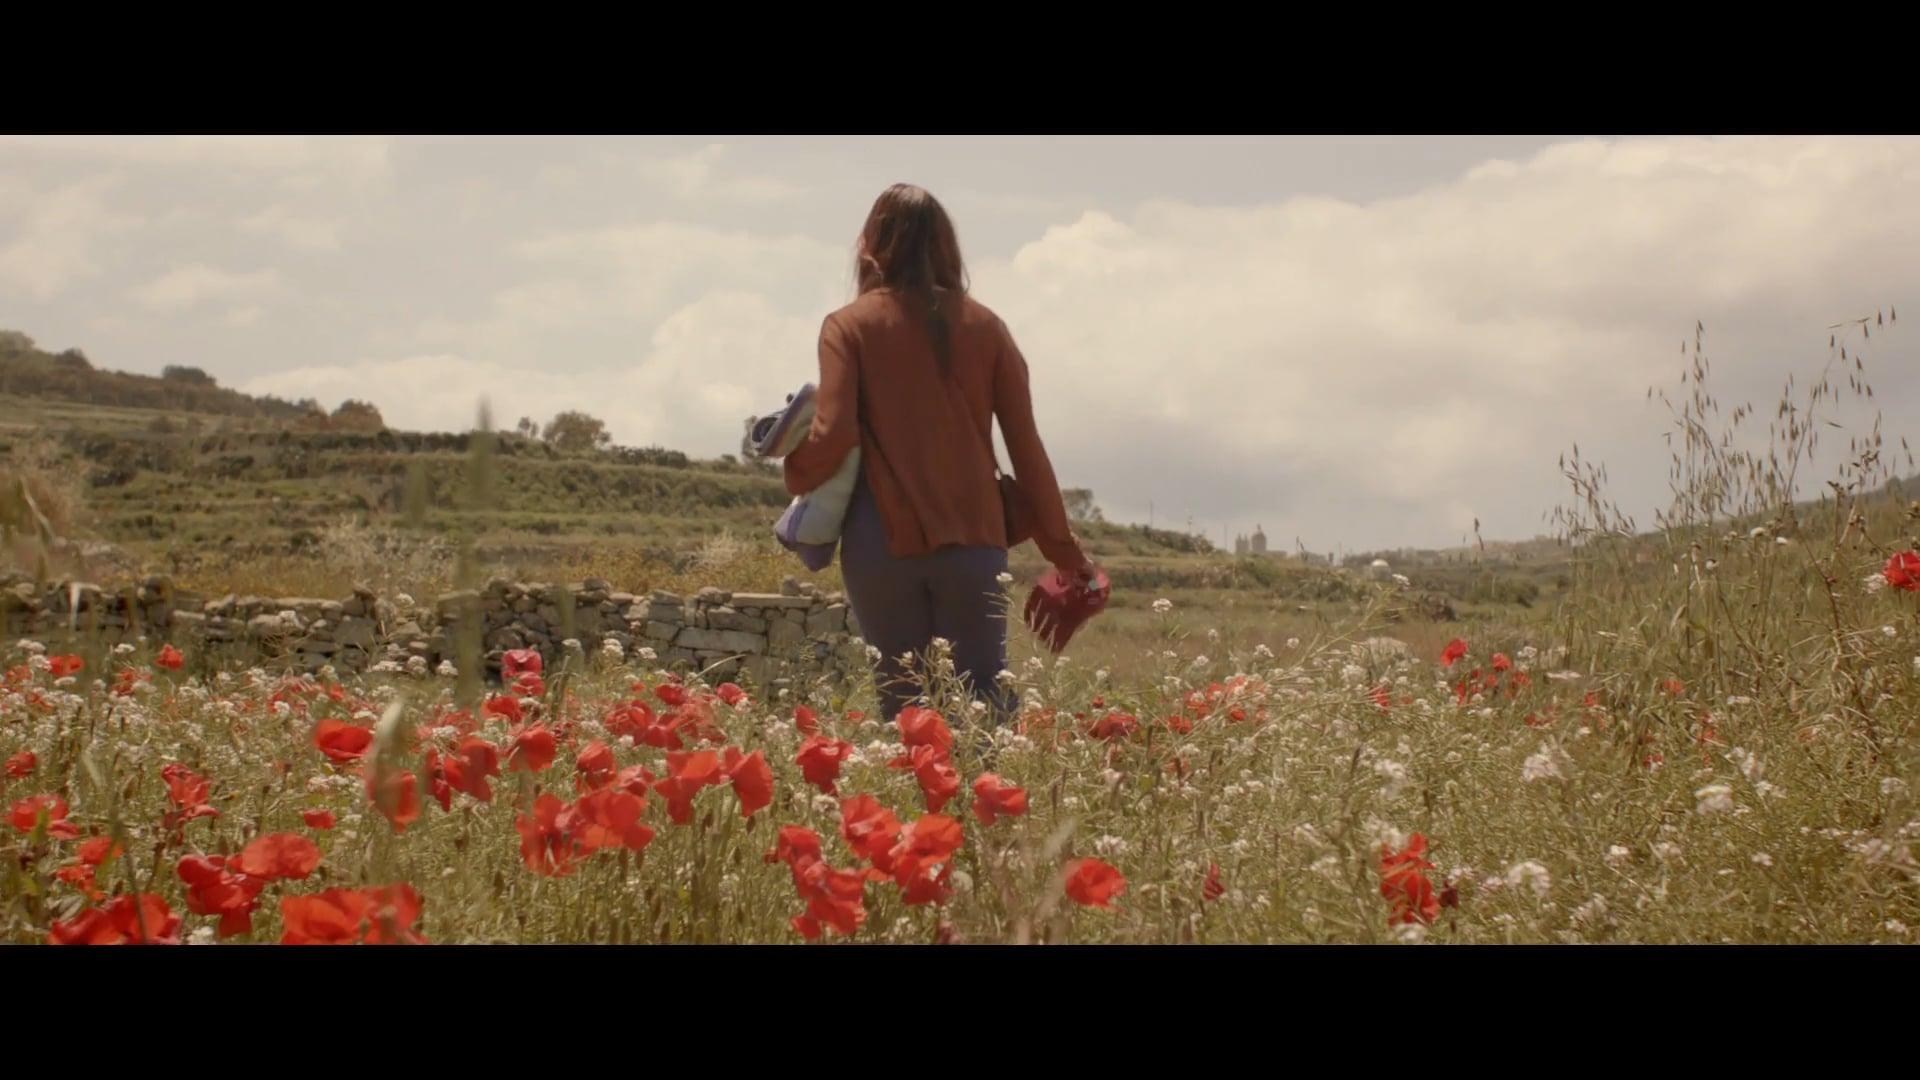 'Gozo' Trailer // 2nd unit DoP // Production Company Bishop Films // Director Miranda Bowen // Winner BFI Best British Film